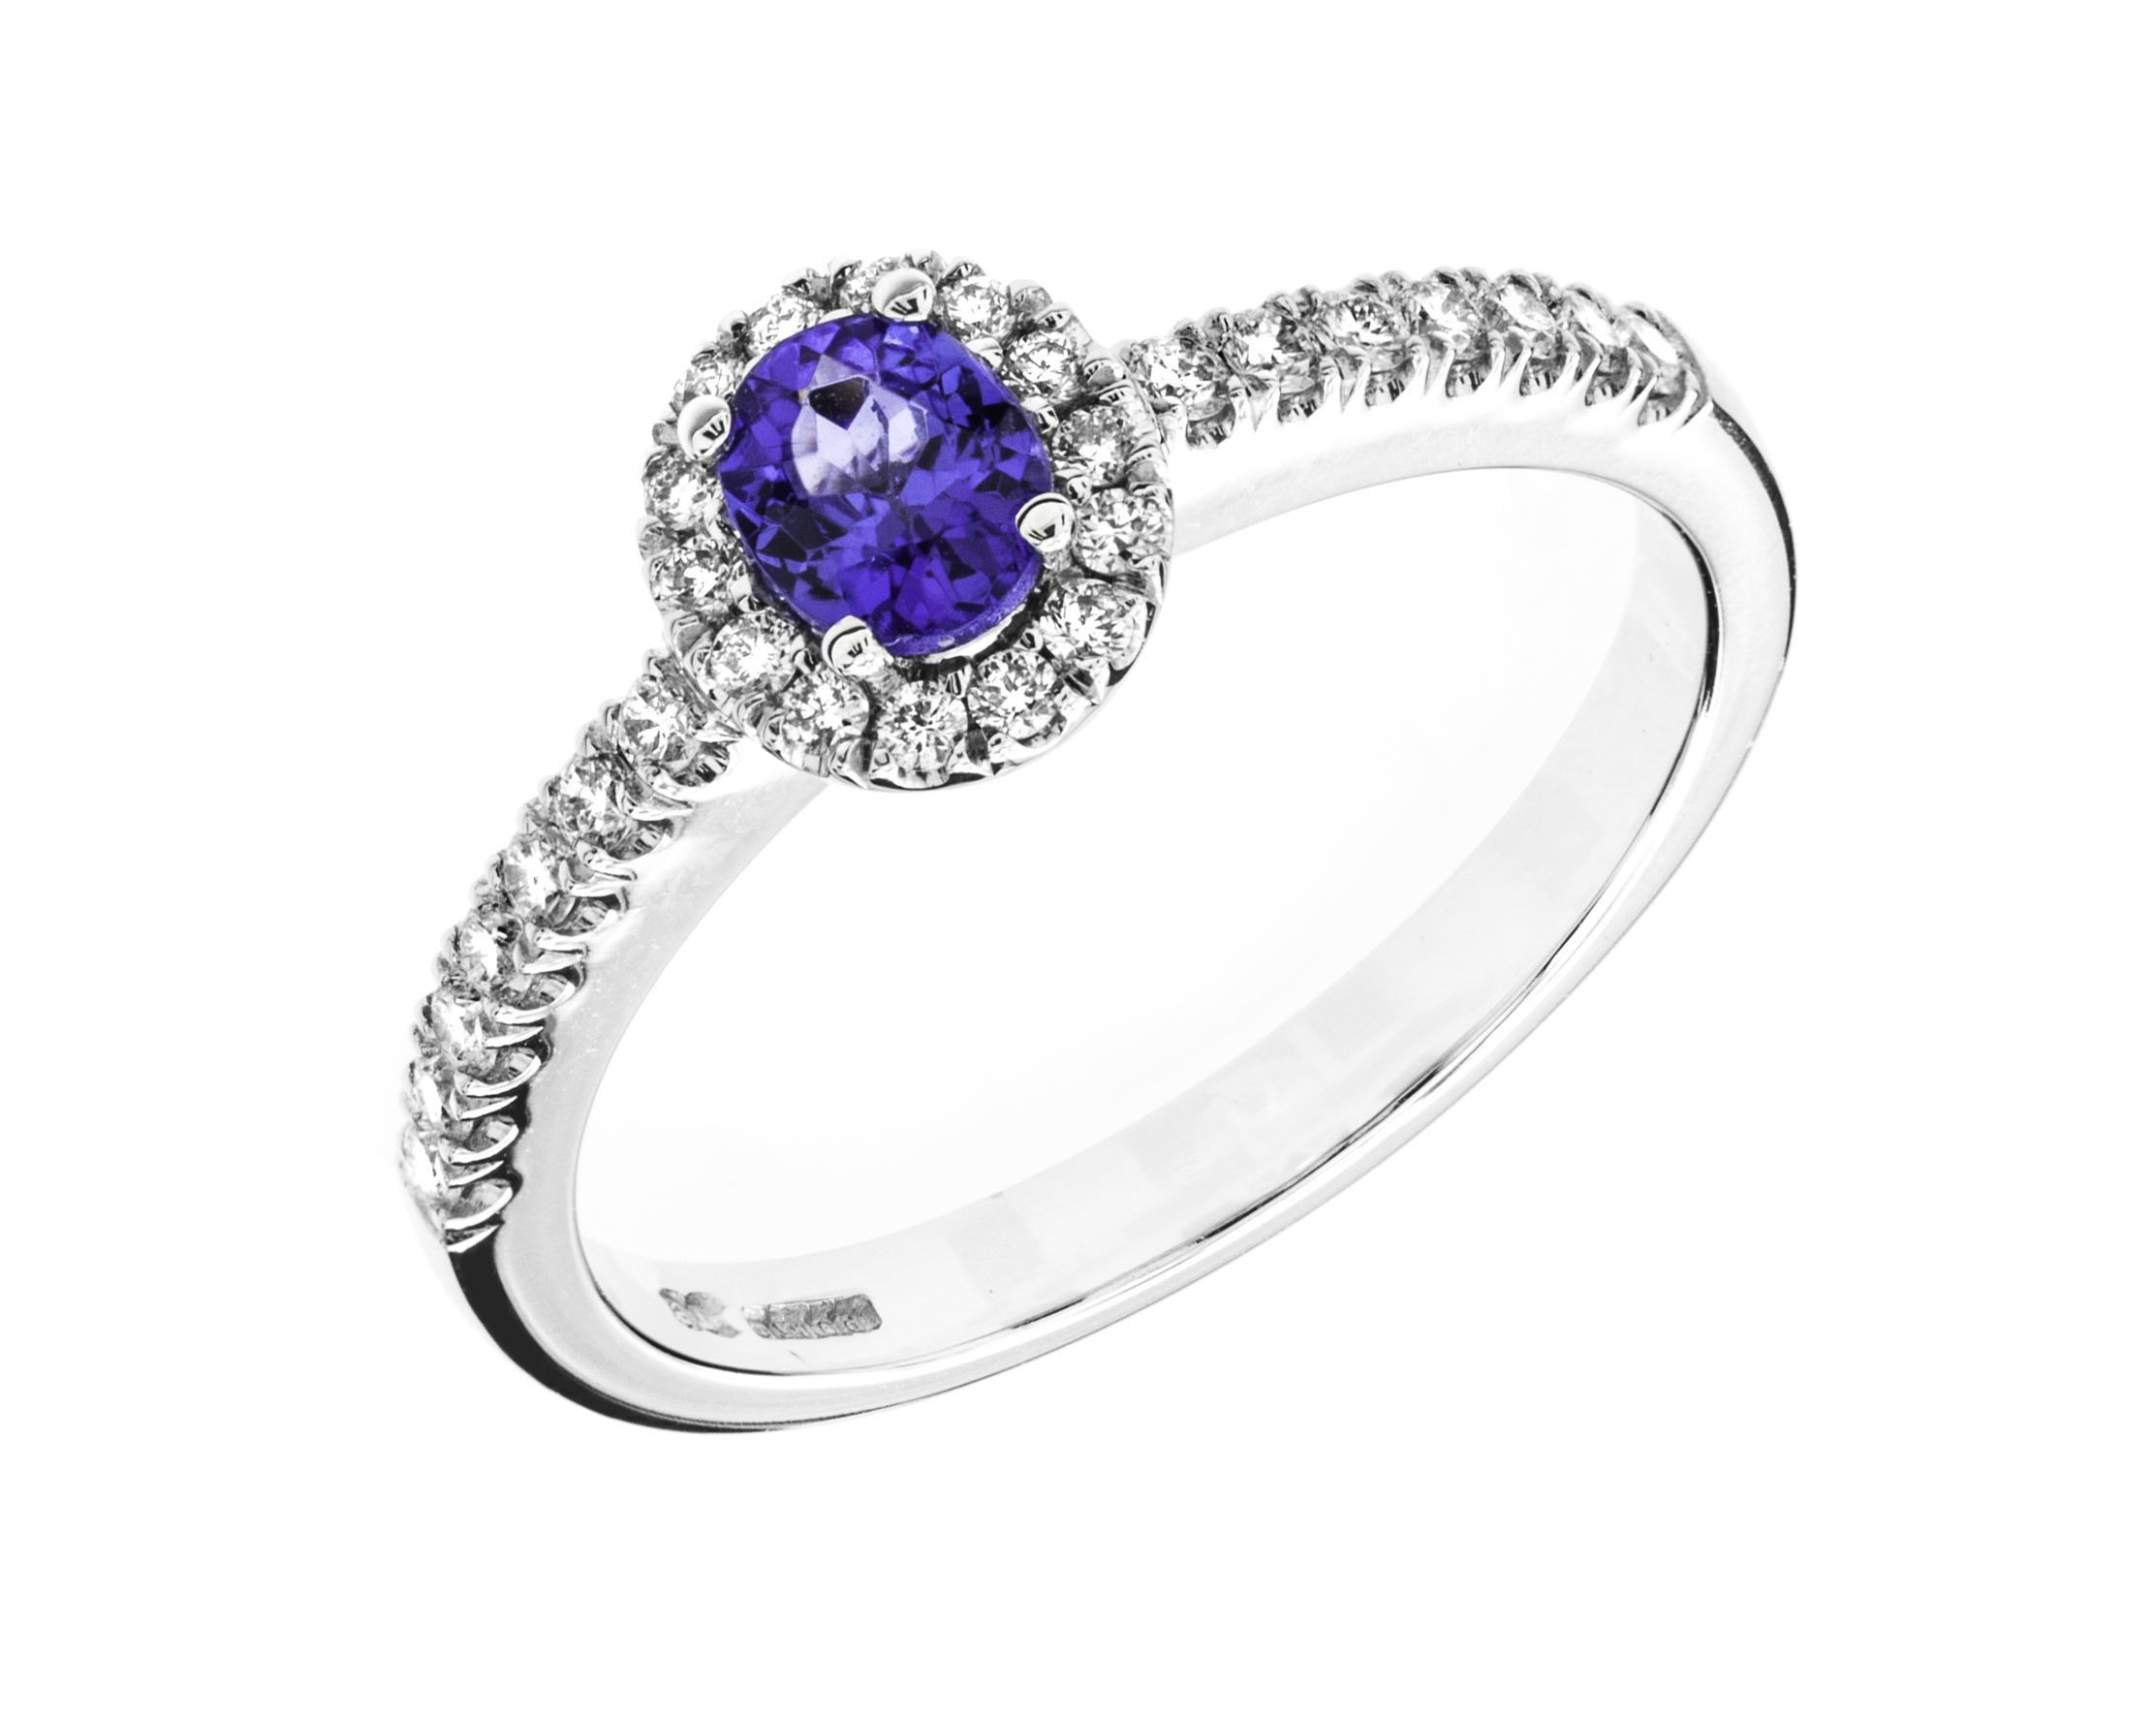 Inel Tanzanit si Diamante Dama Aur Alb 18kt cu un Tanzanit Oval si Diamante Rotunde-img1